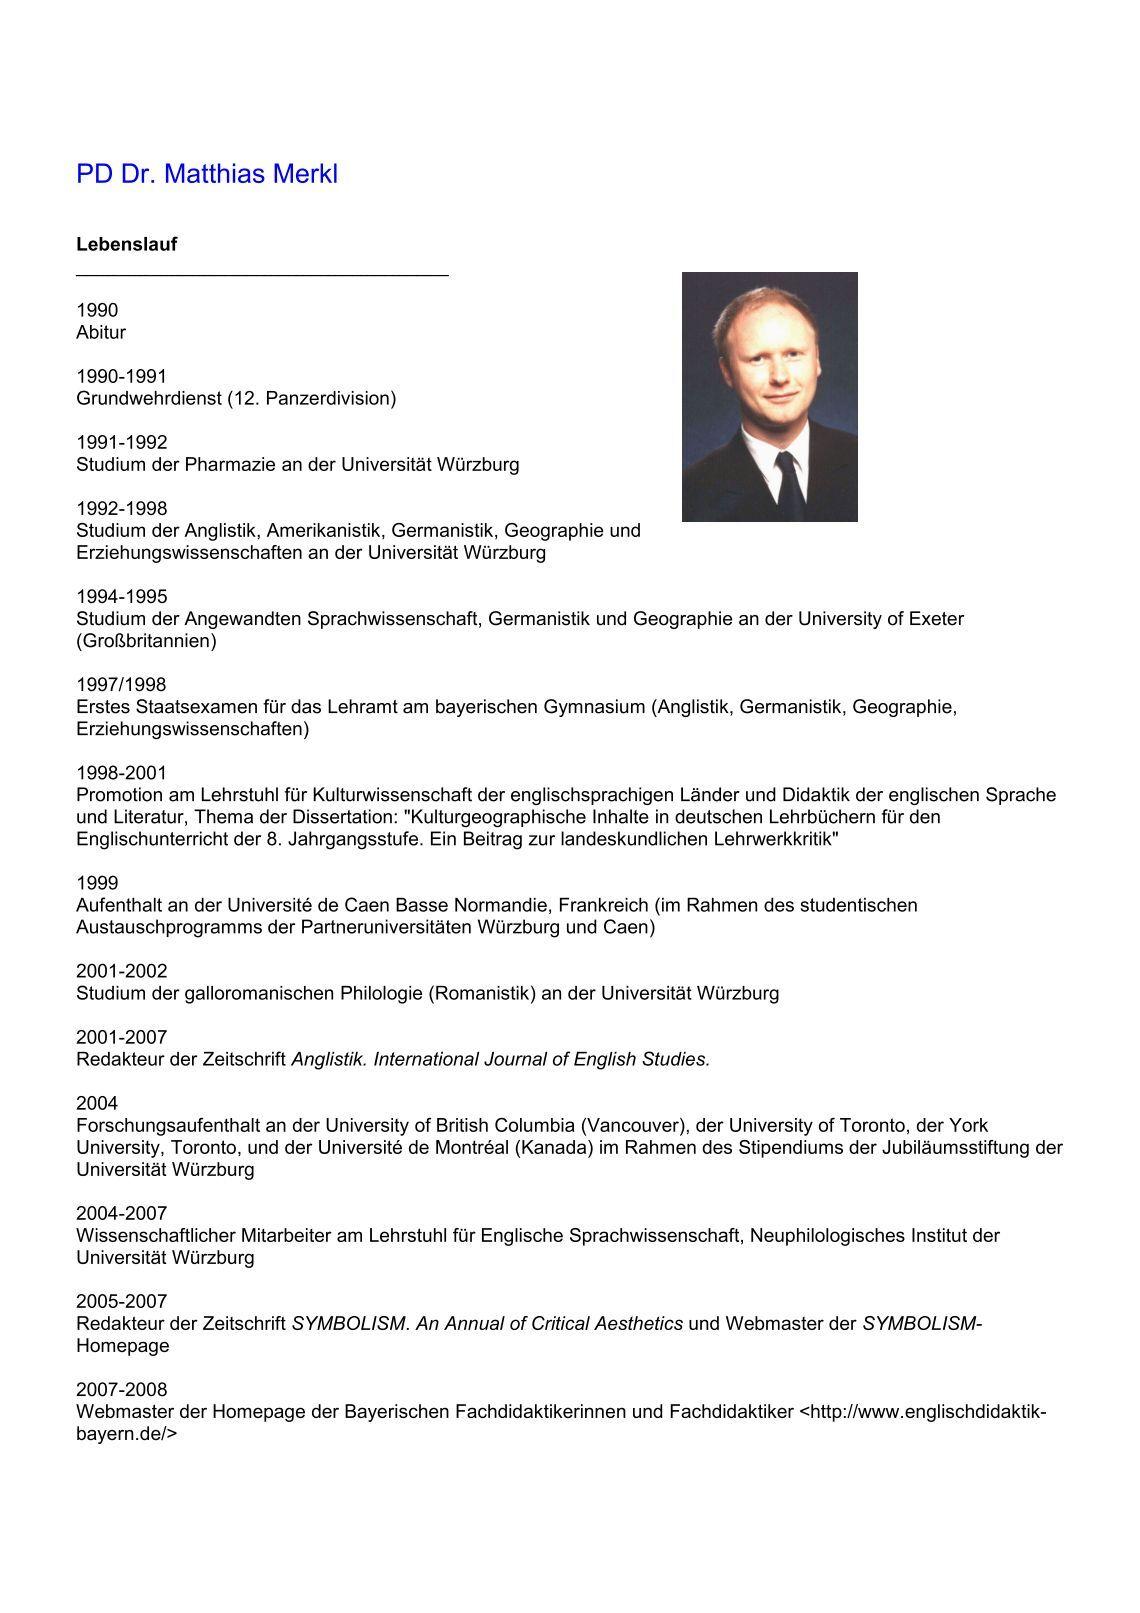 lebenslauf muster vorlage 7. lebenslauf universitt mannheim ...